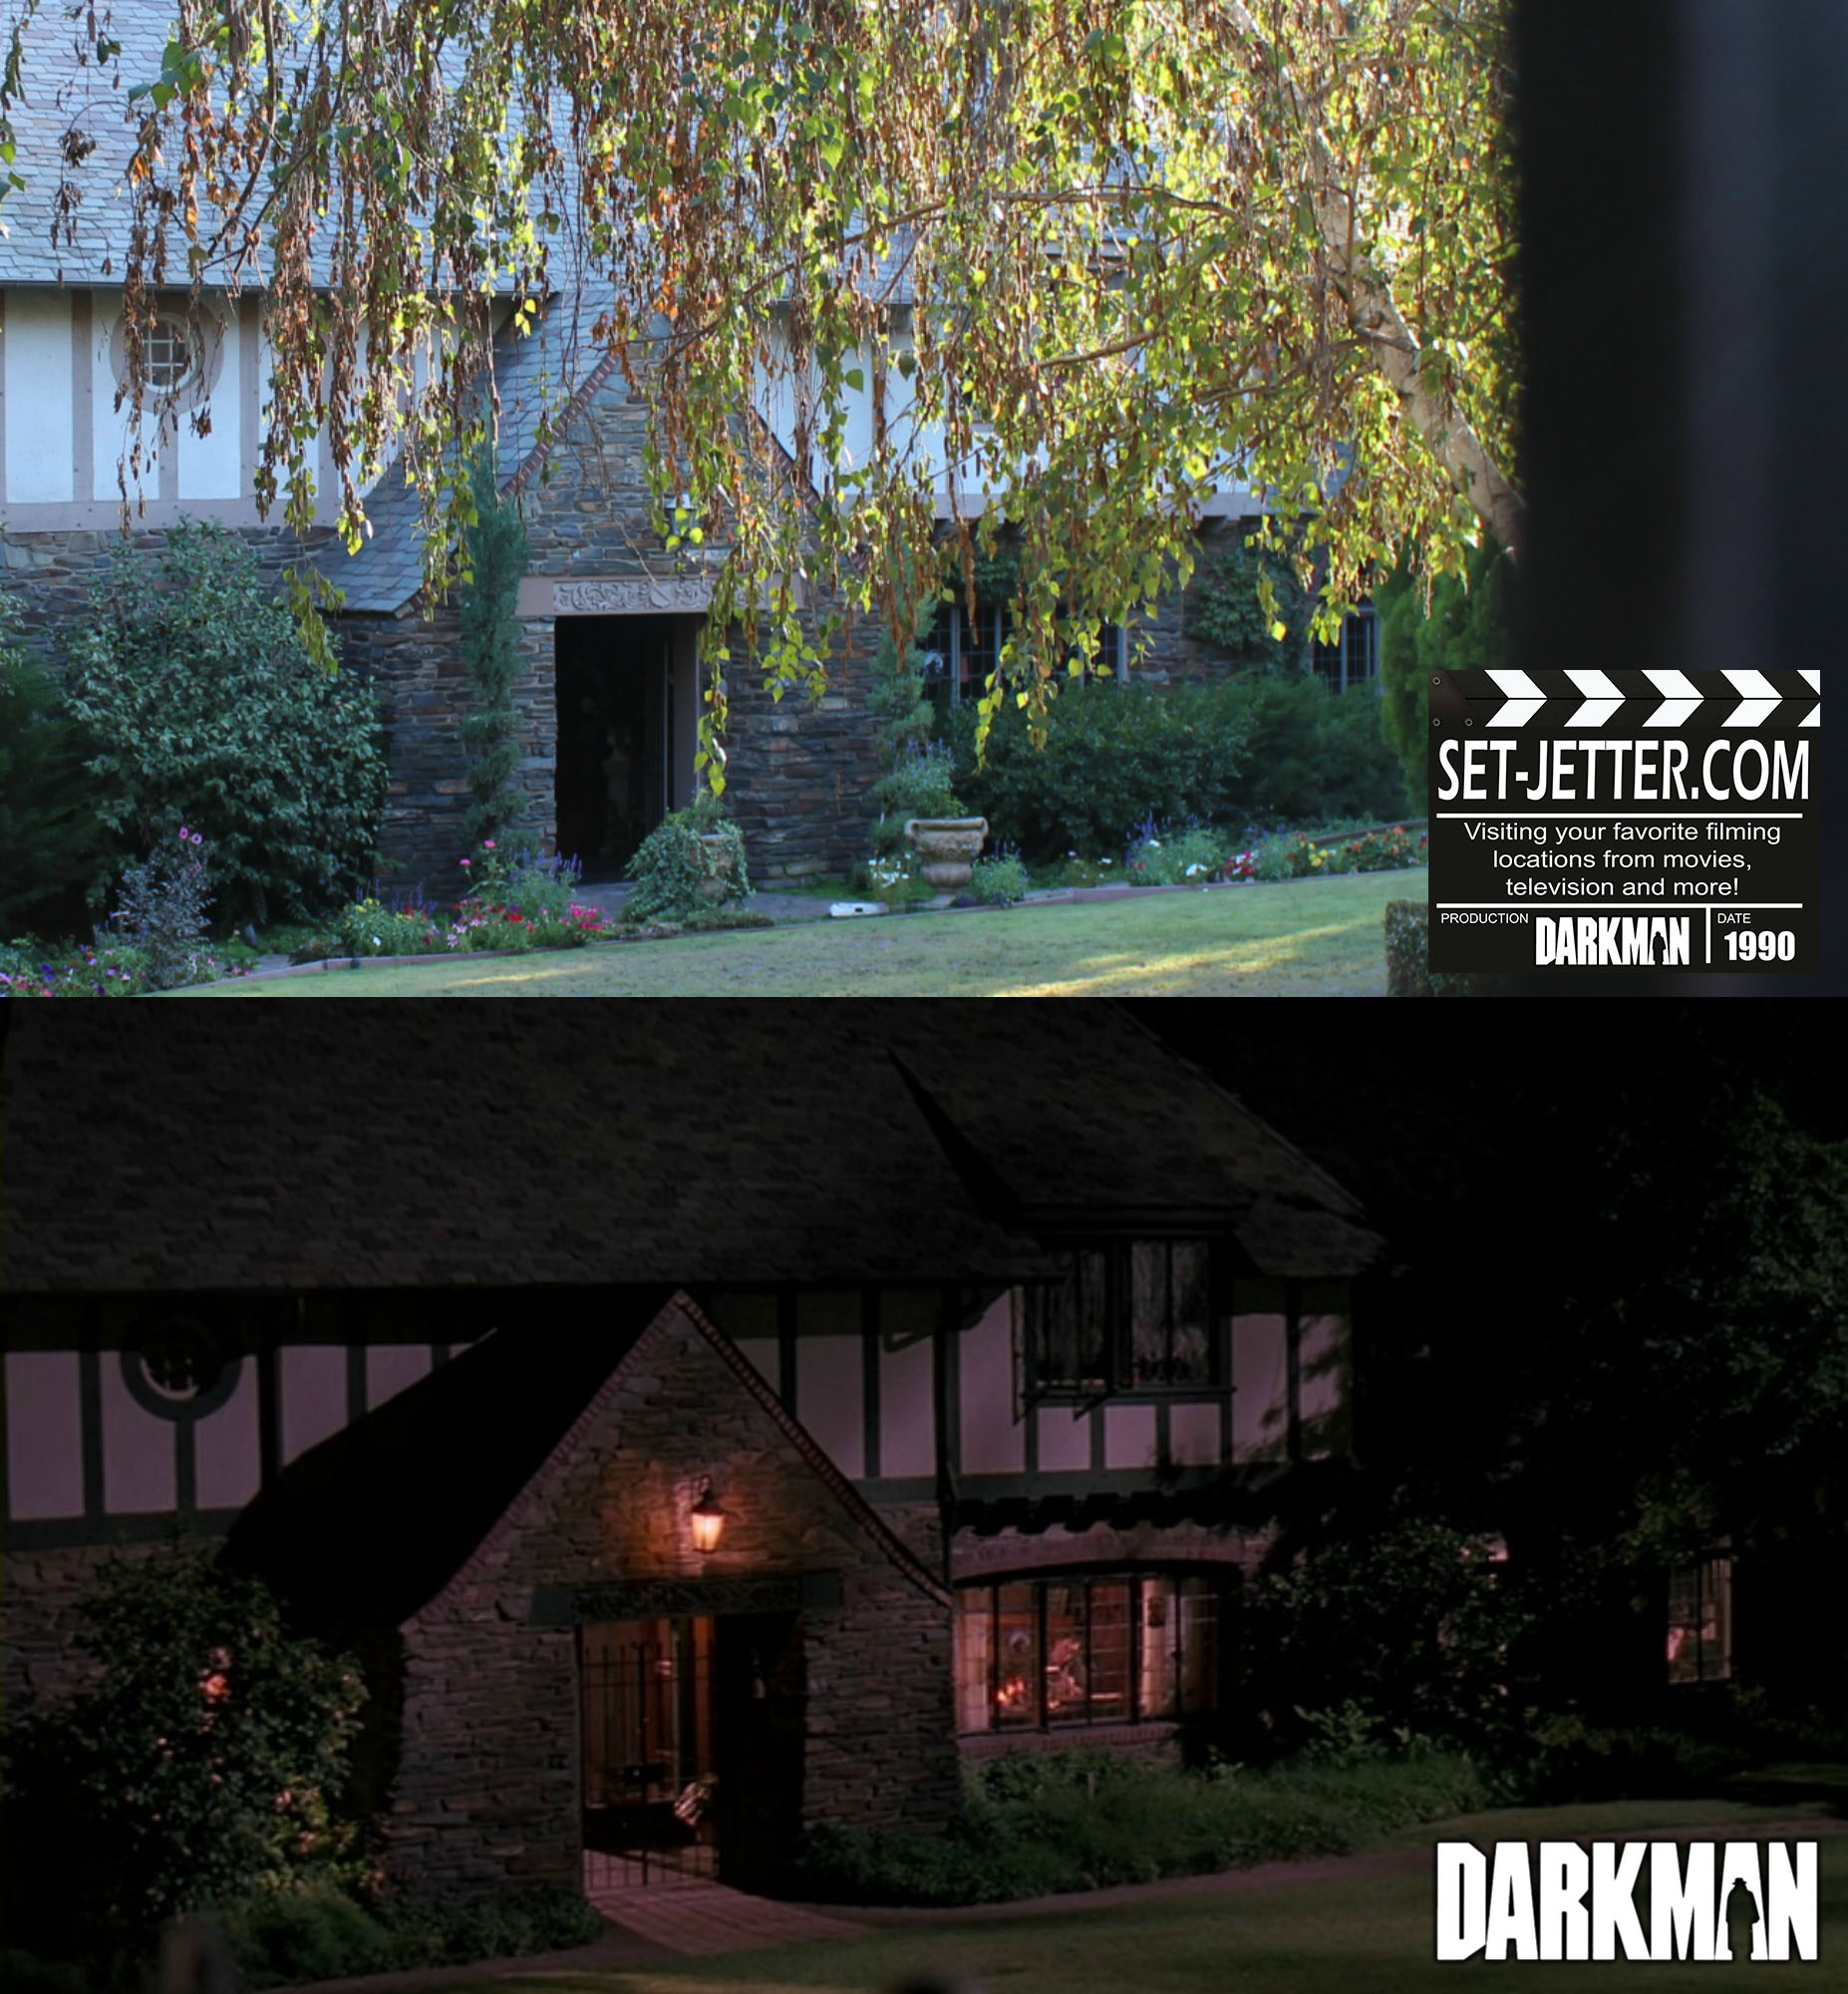 Darkman 18.jpg